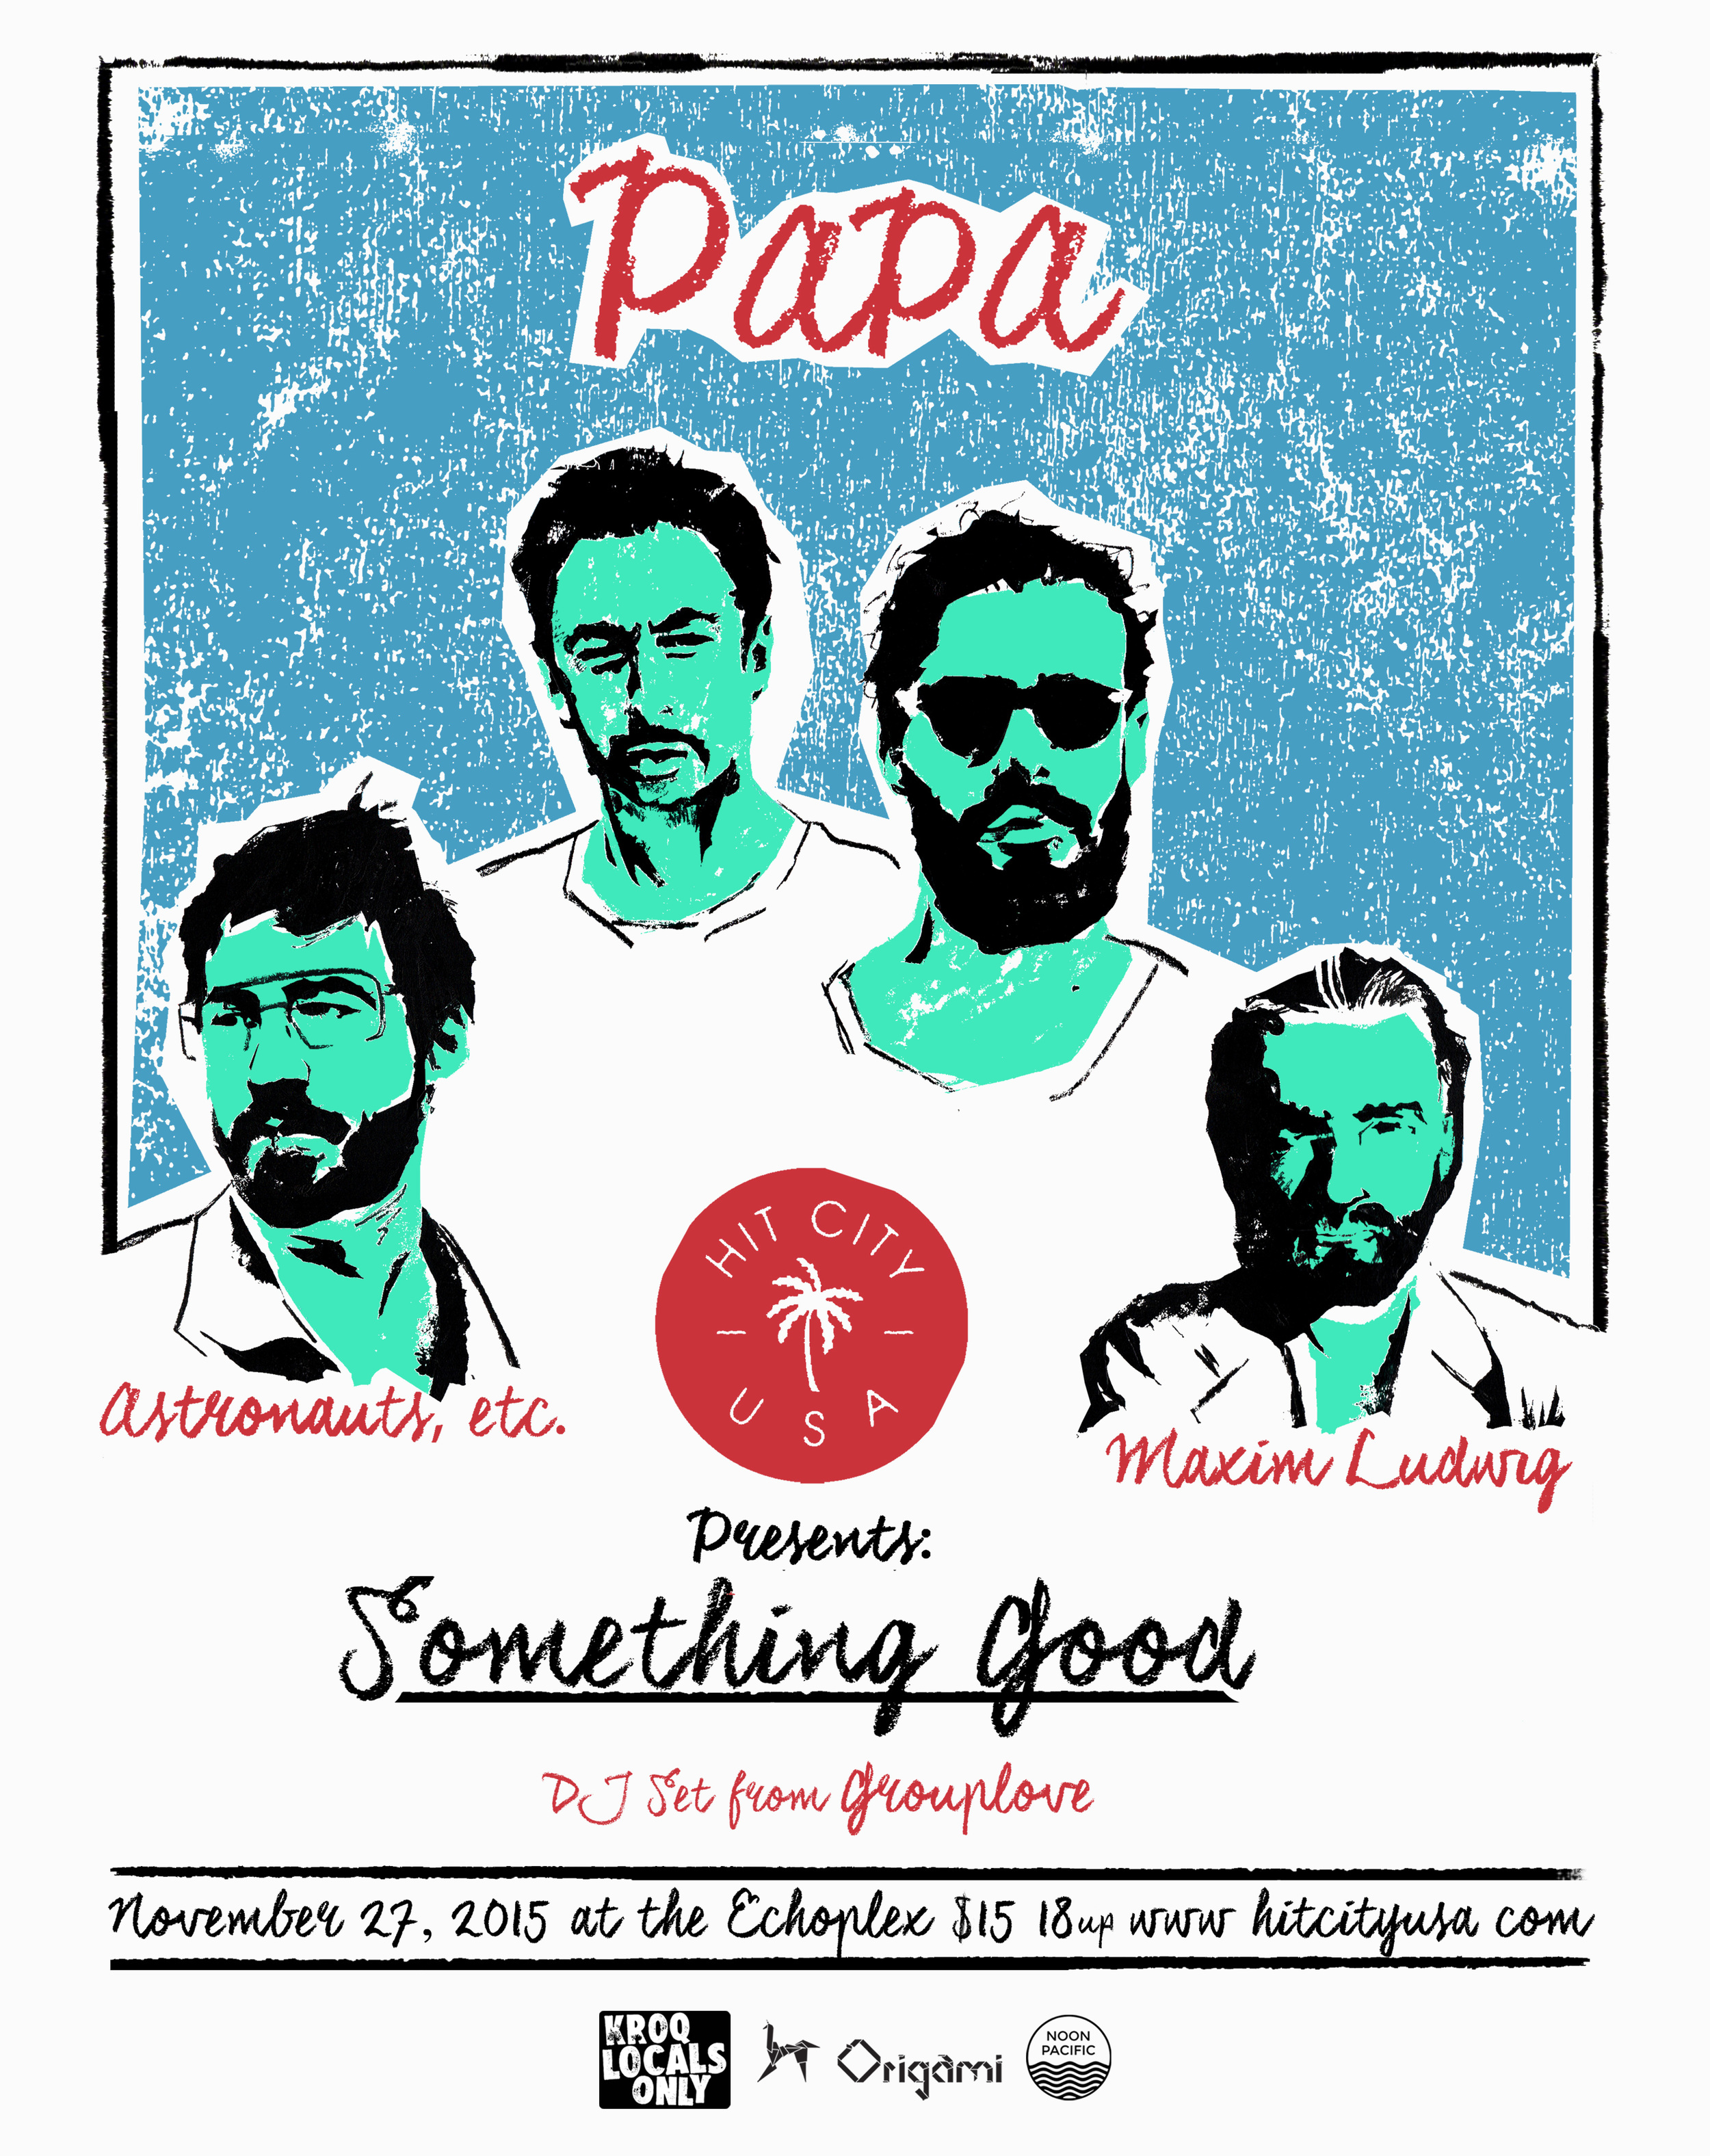 Something Good w/ Papa, Astronauts, etc. &Maxim Ludwig